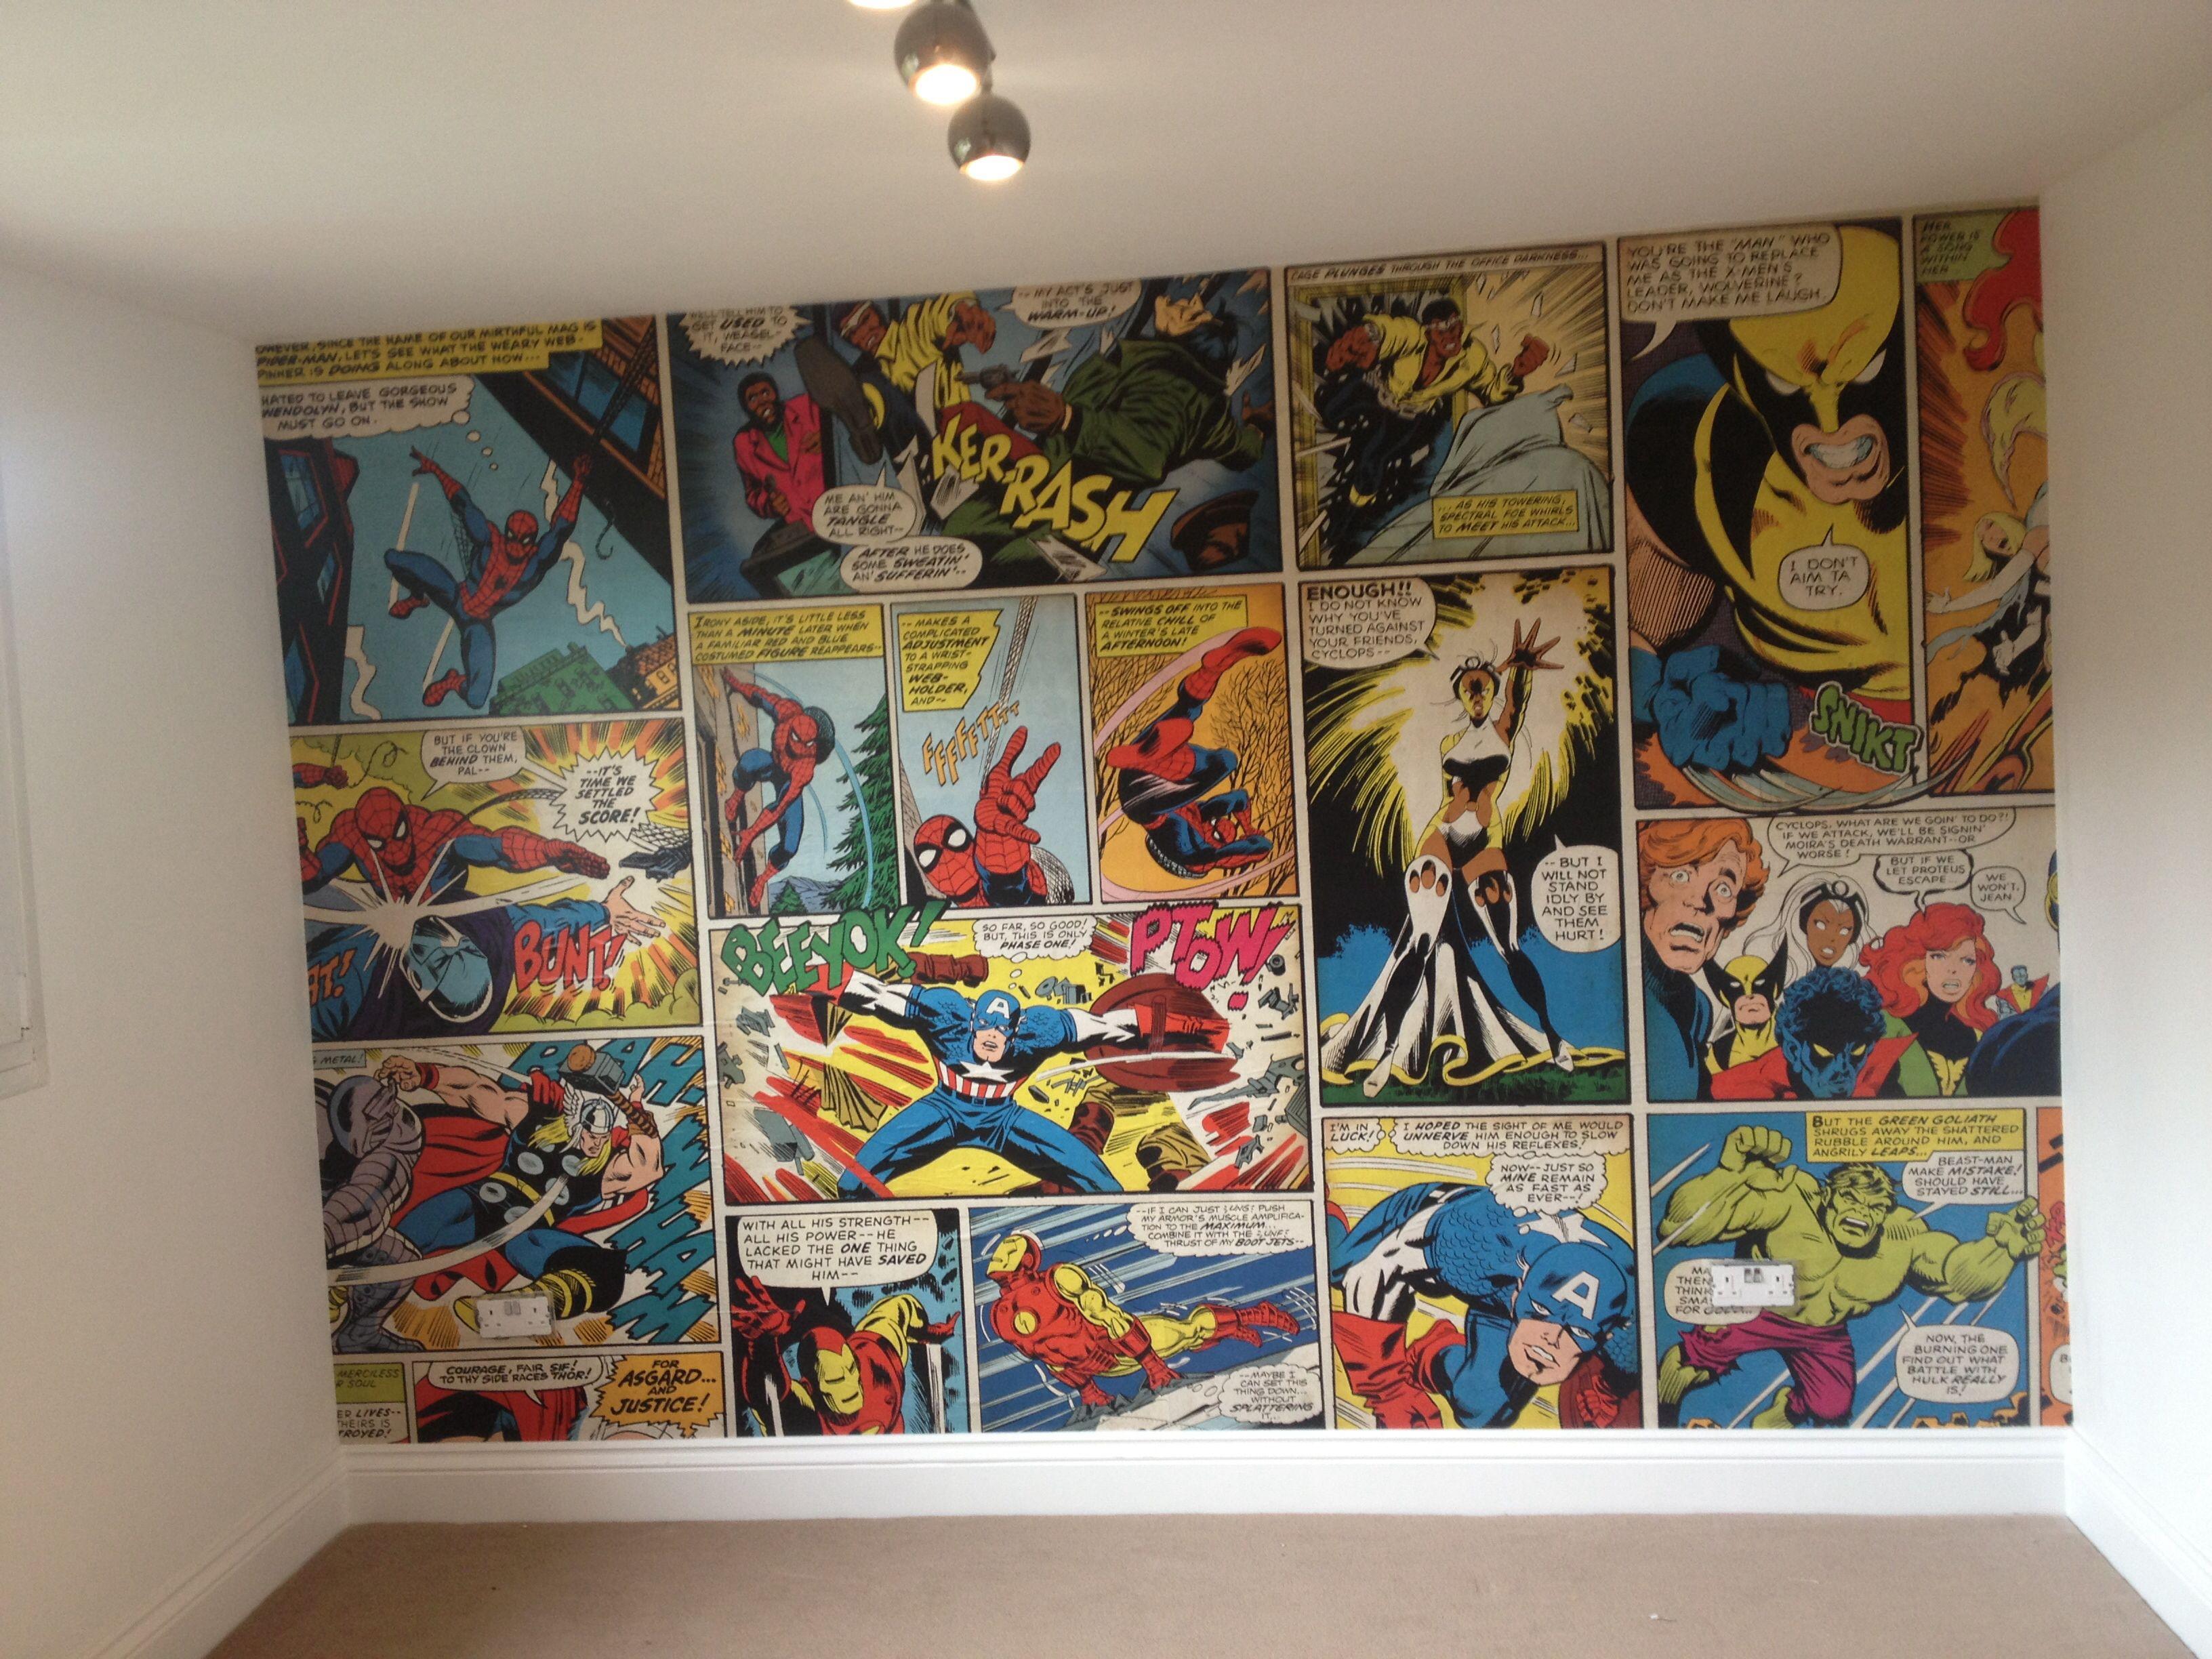 Marvel comic wallpaper, Ronnie's bedroom